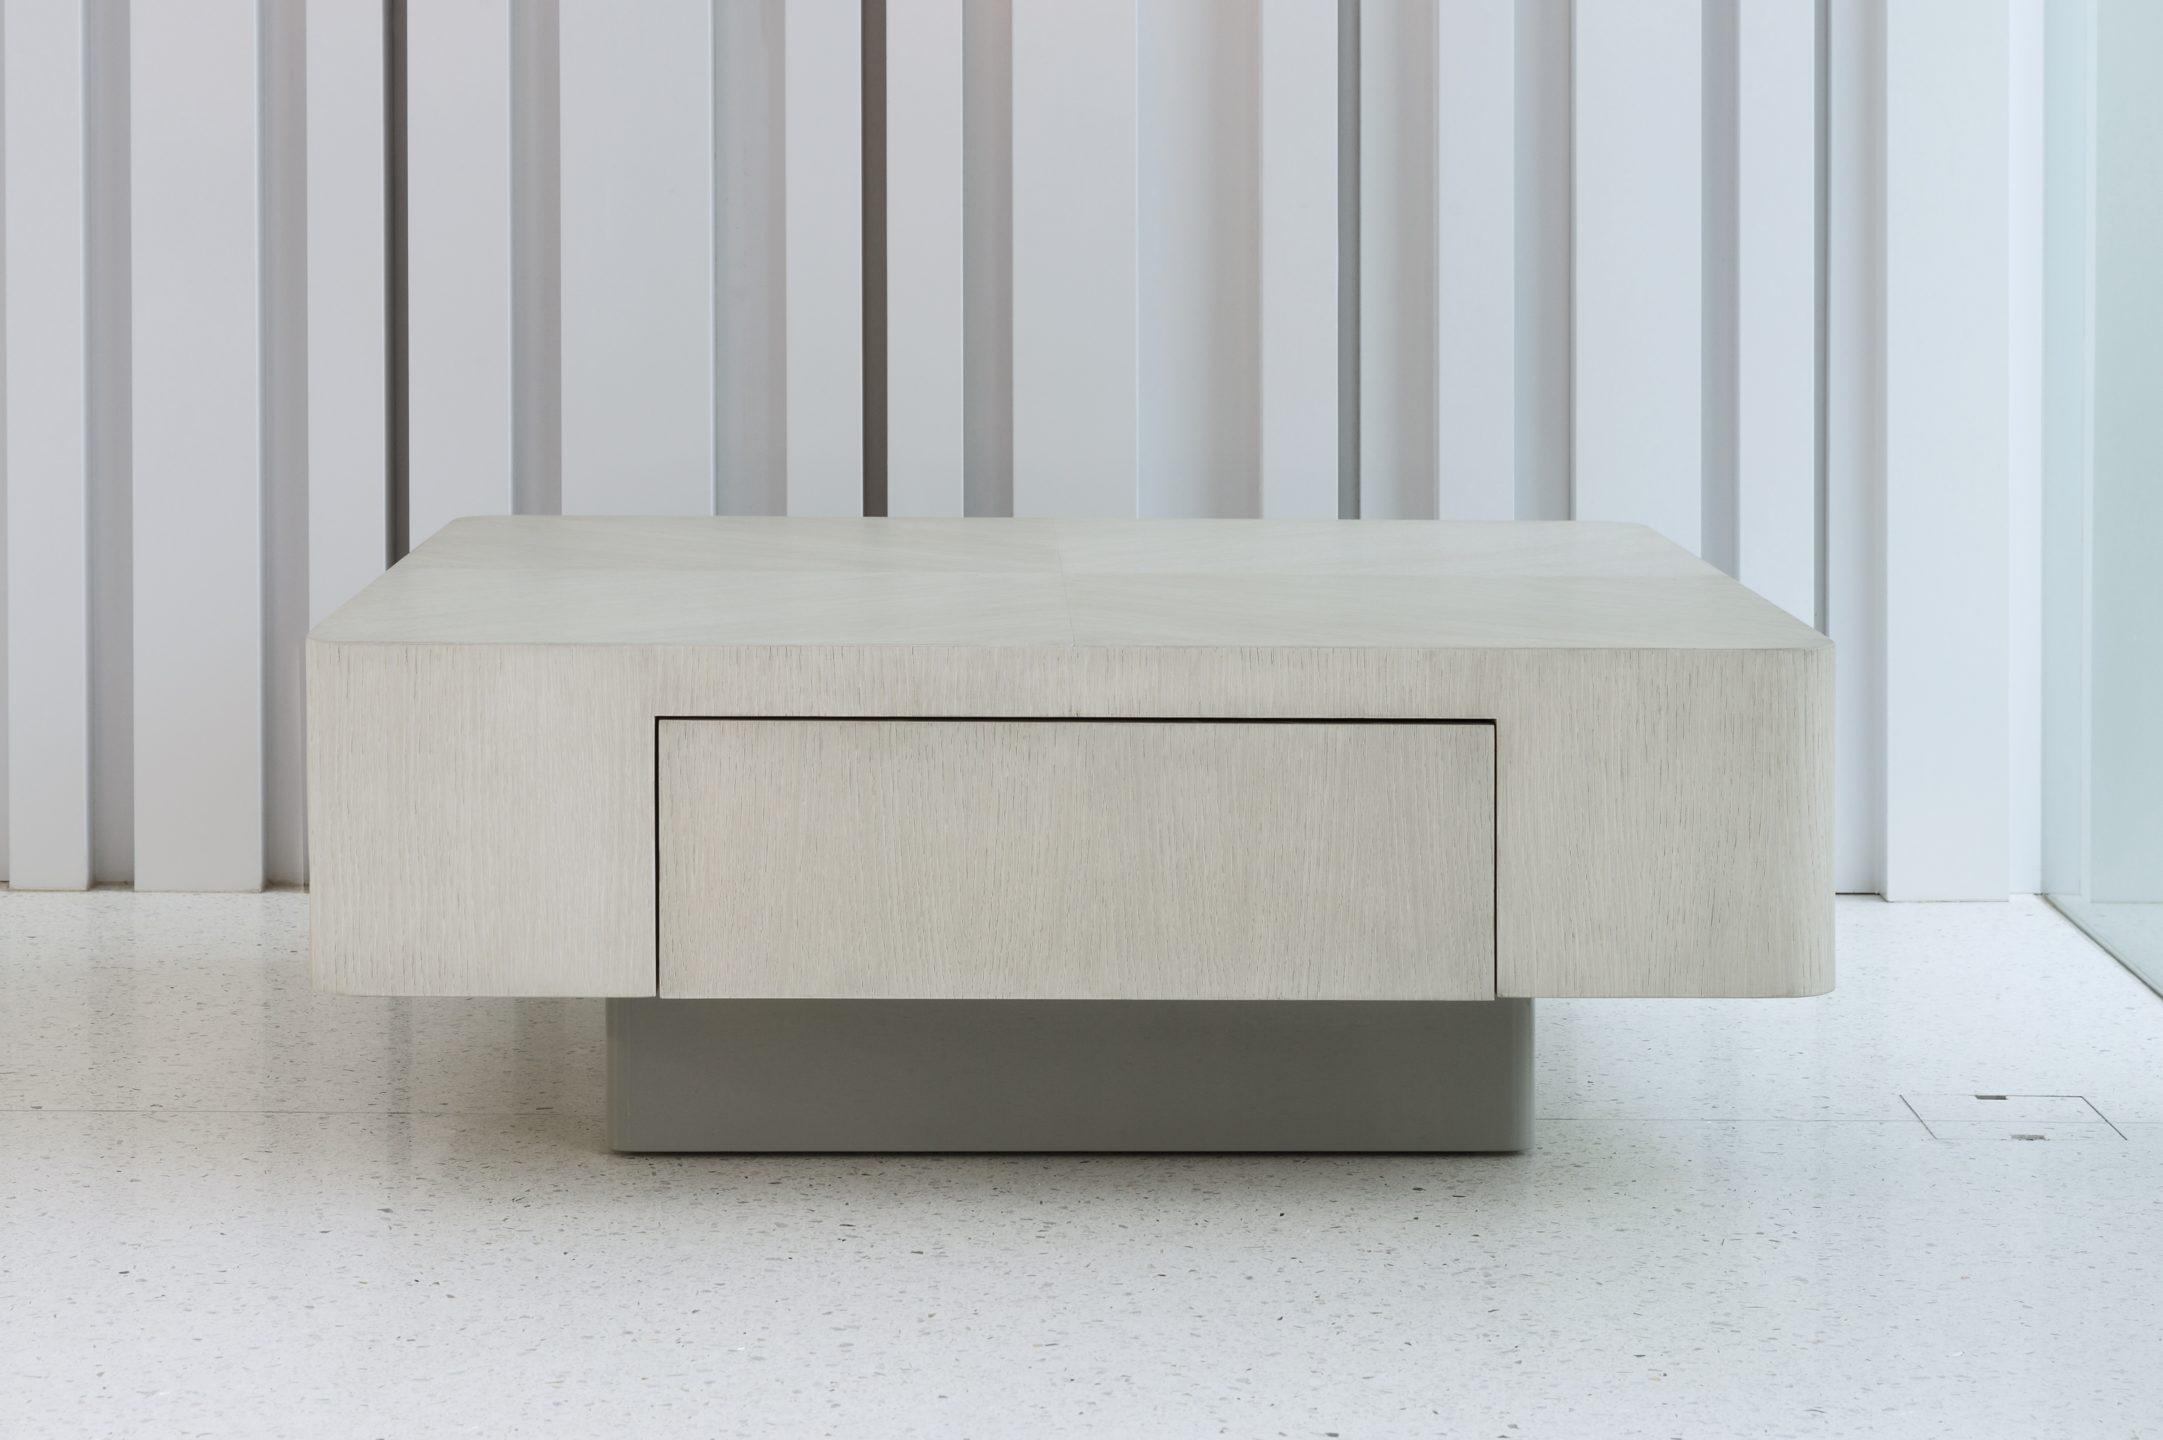 Studio_William_Hefner_products_leia_coffee_table_1